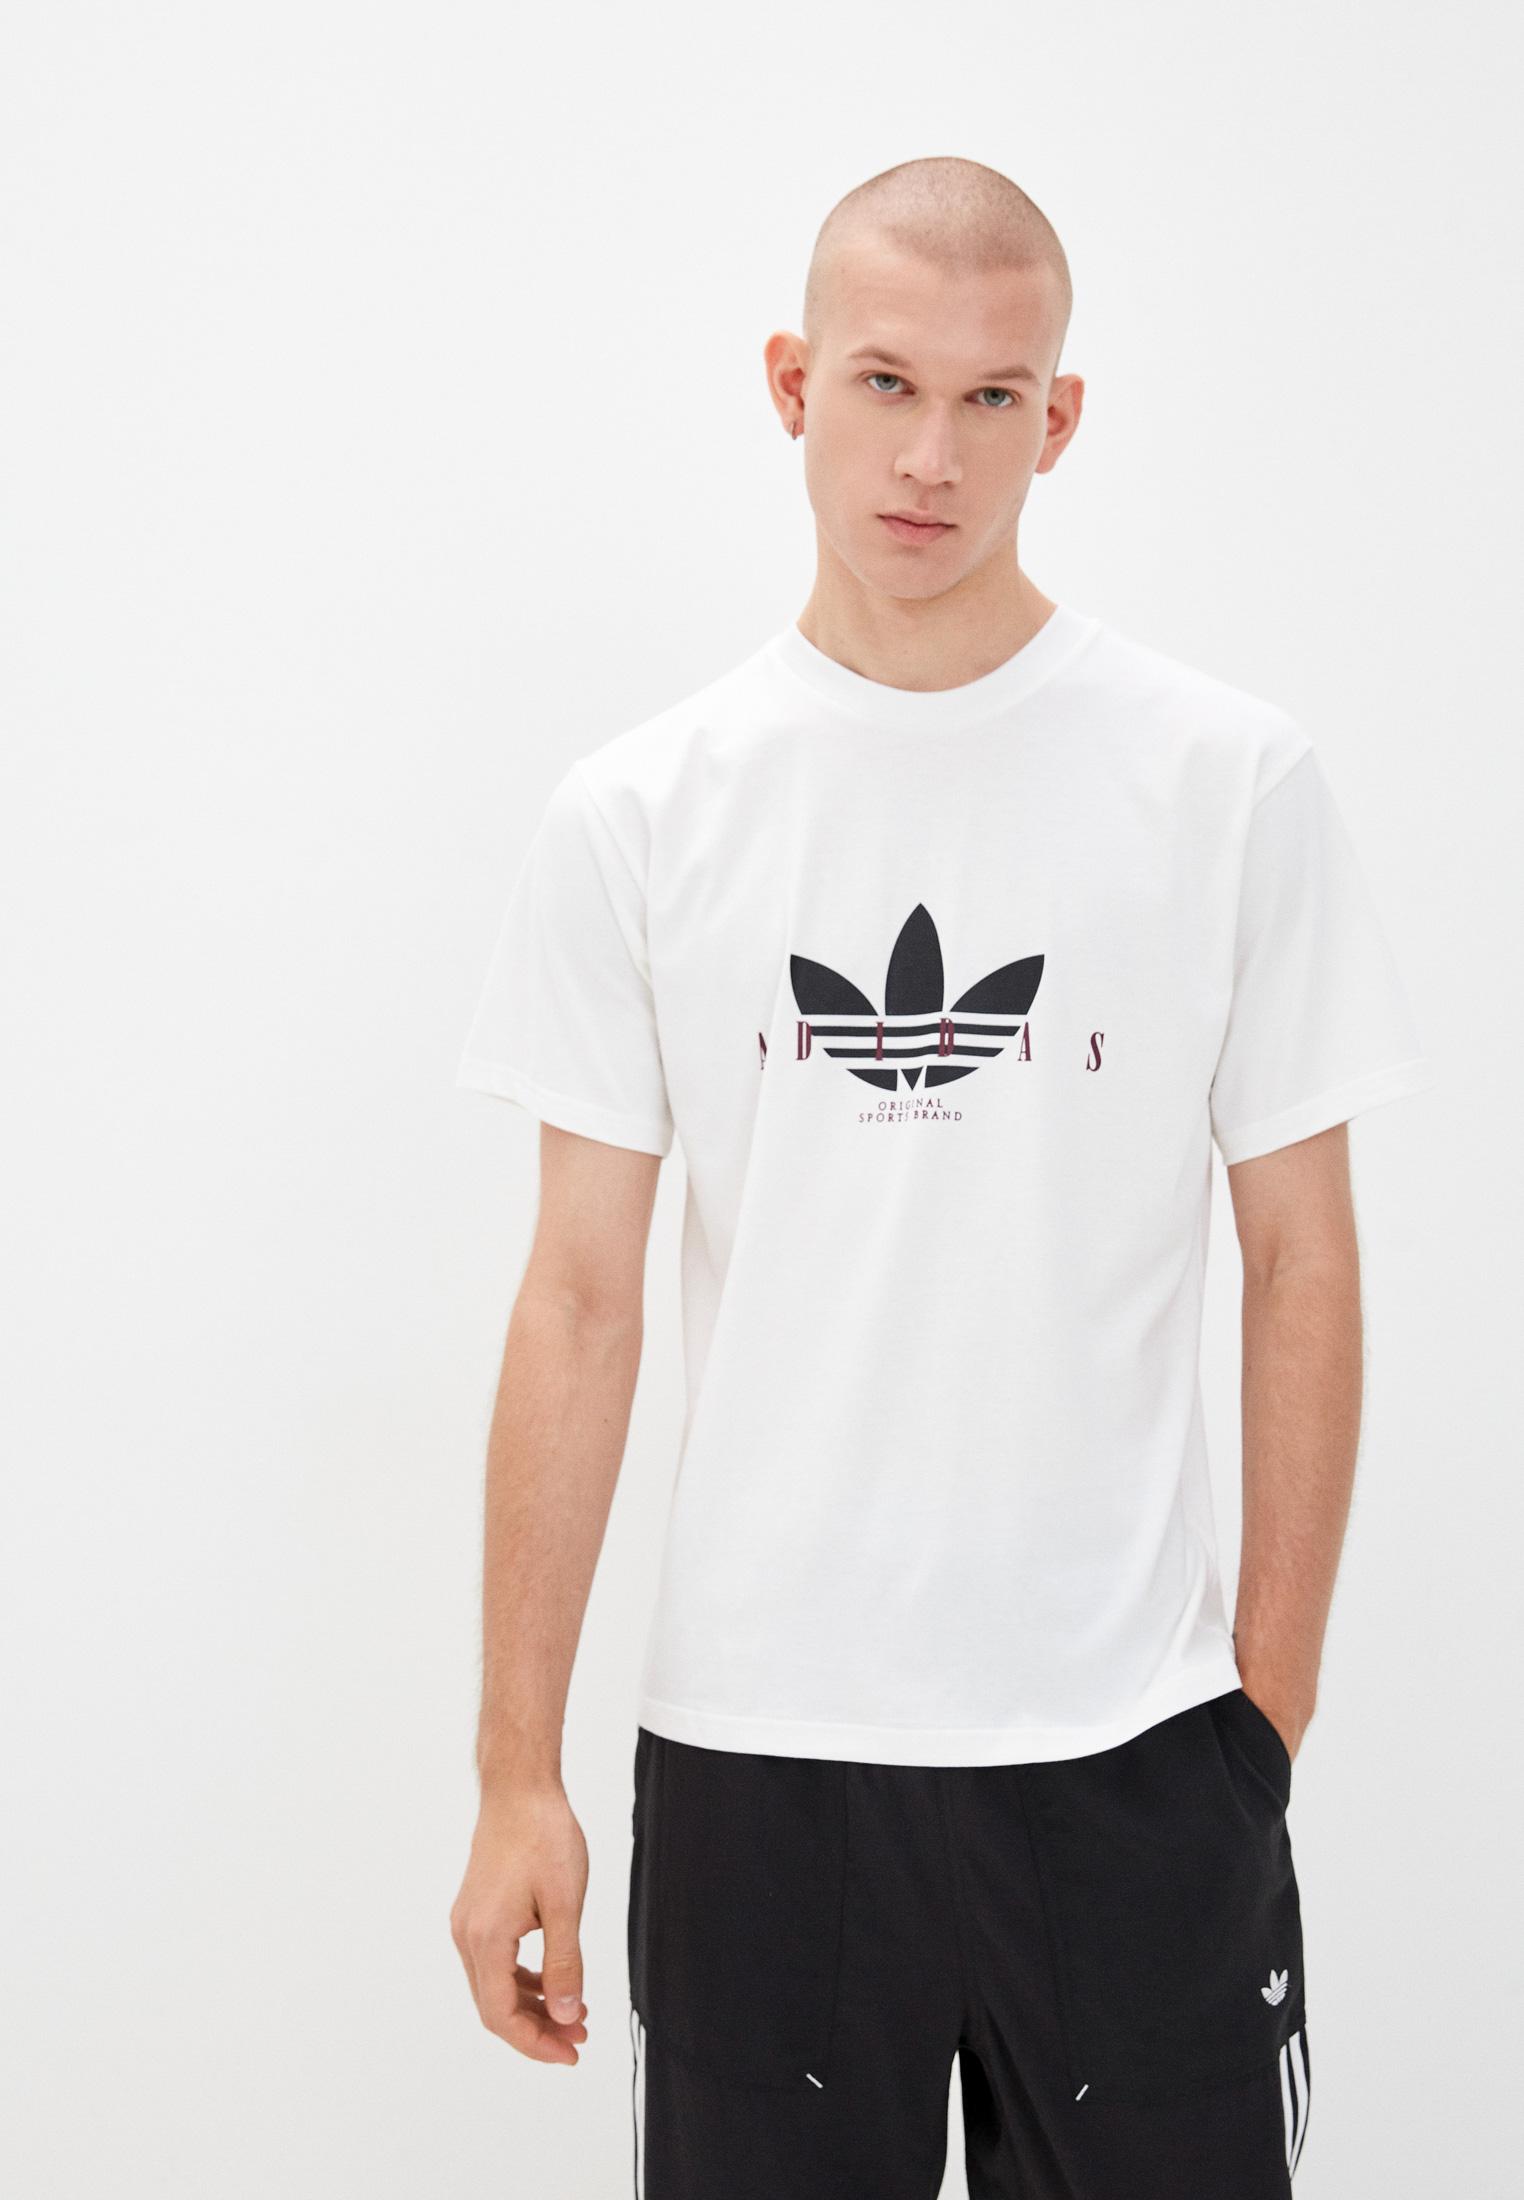 Футболка Adidas Originals (Адидас Ориджиналс) Футболка adidas Originals